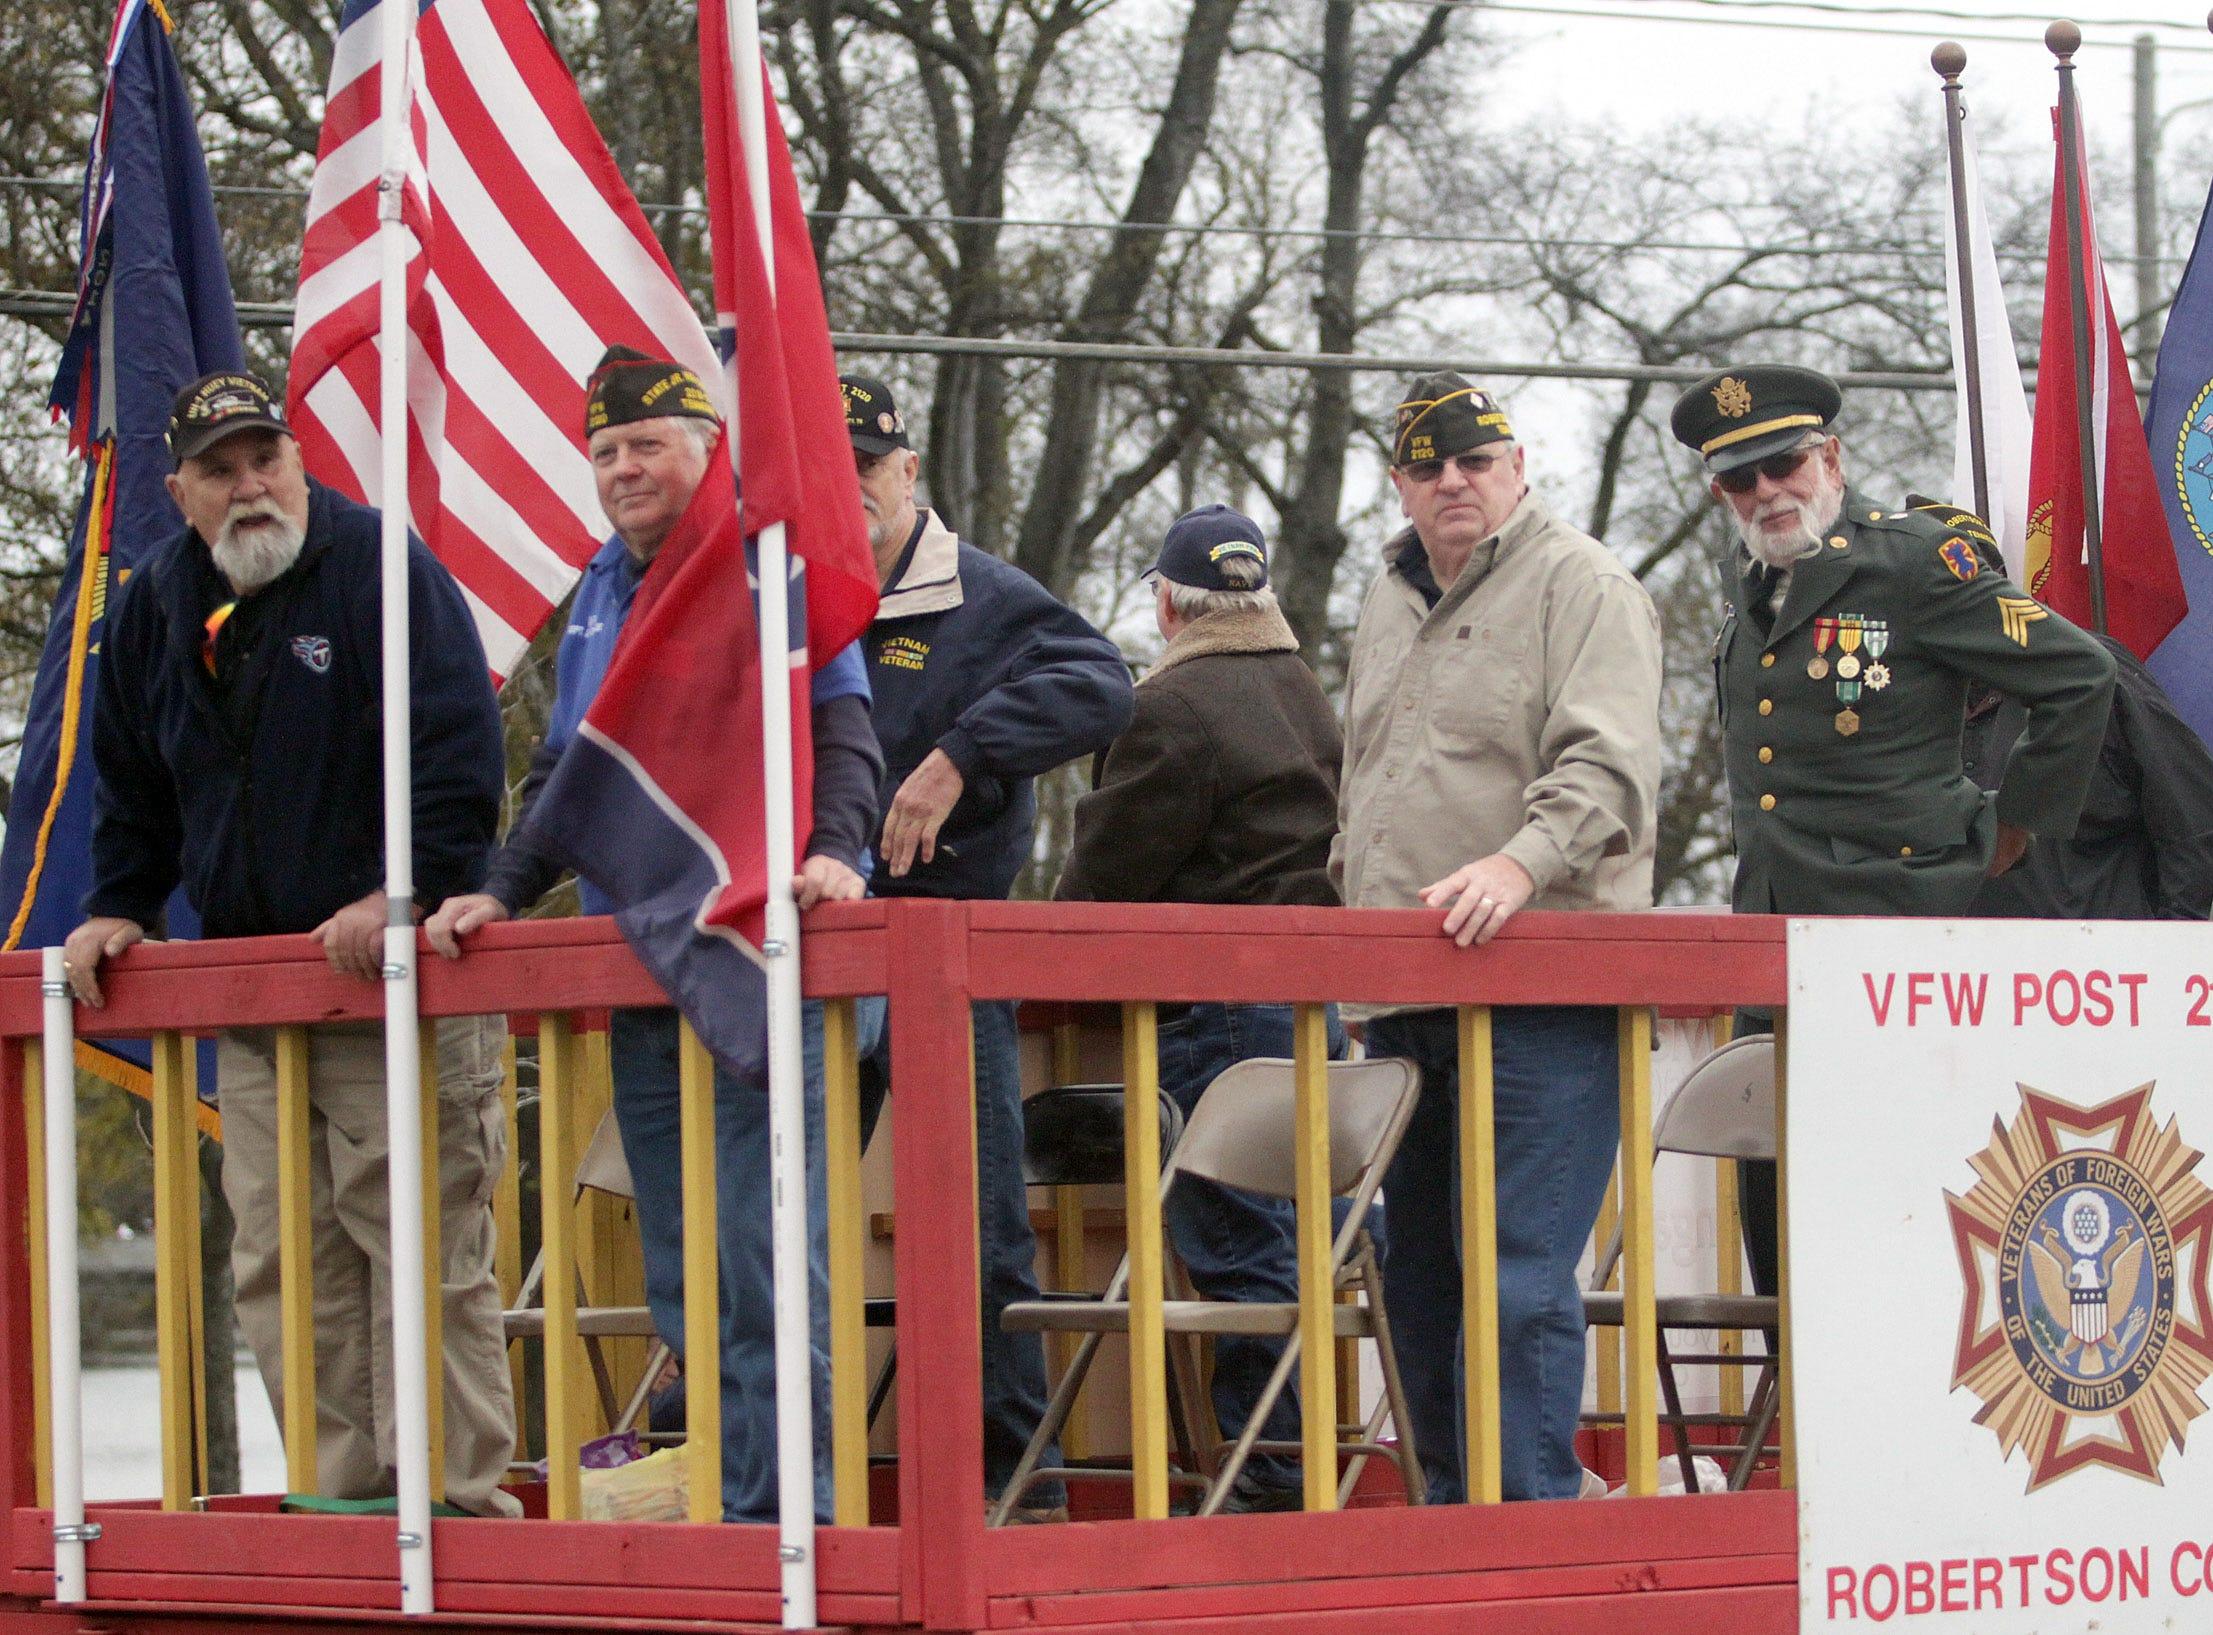 Veterans from Post 2120 ride in the Veterans Day Parade in Hendersonville, TN on Sunday, November 4, 2018.